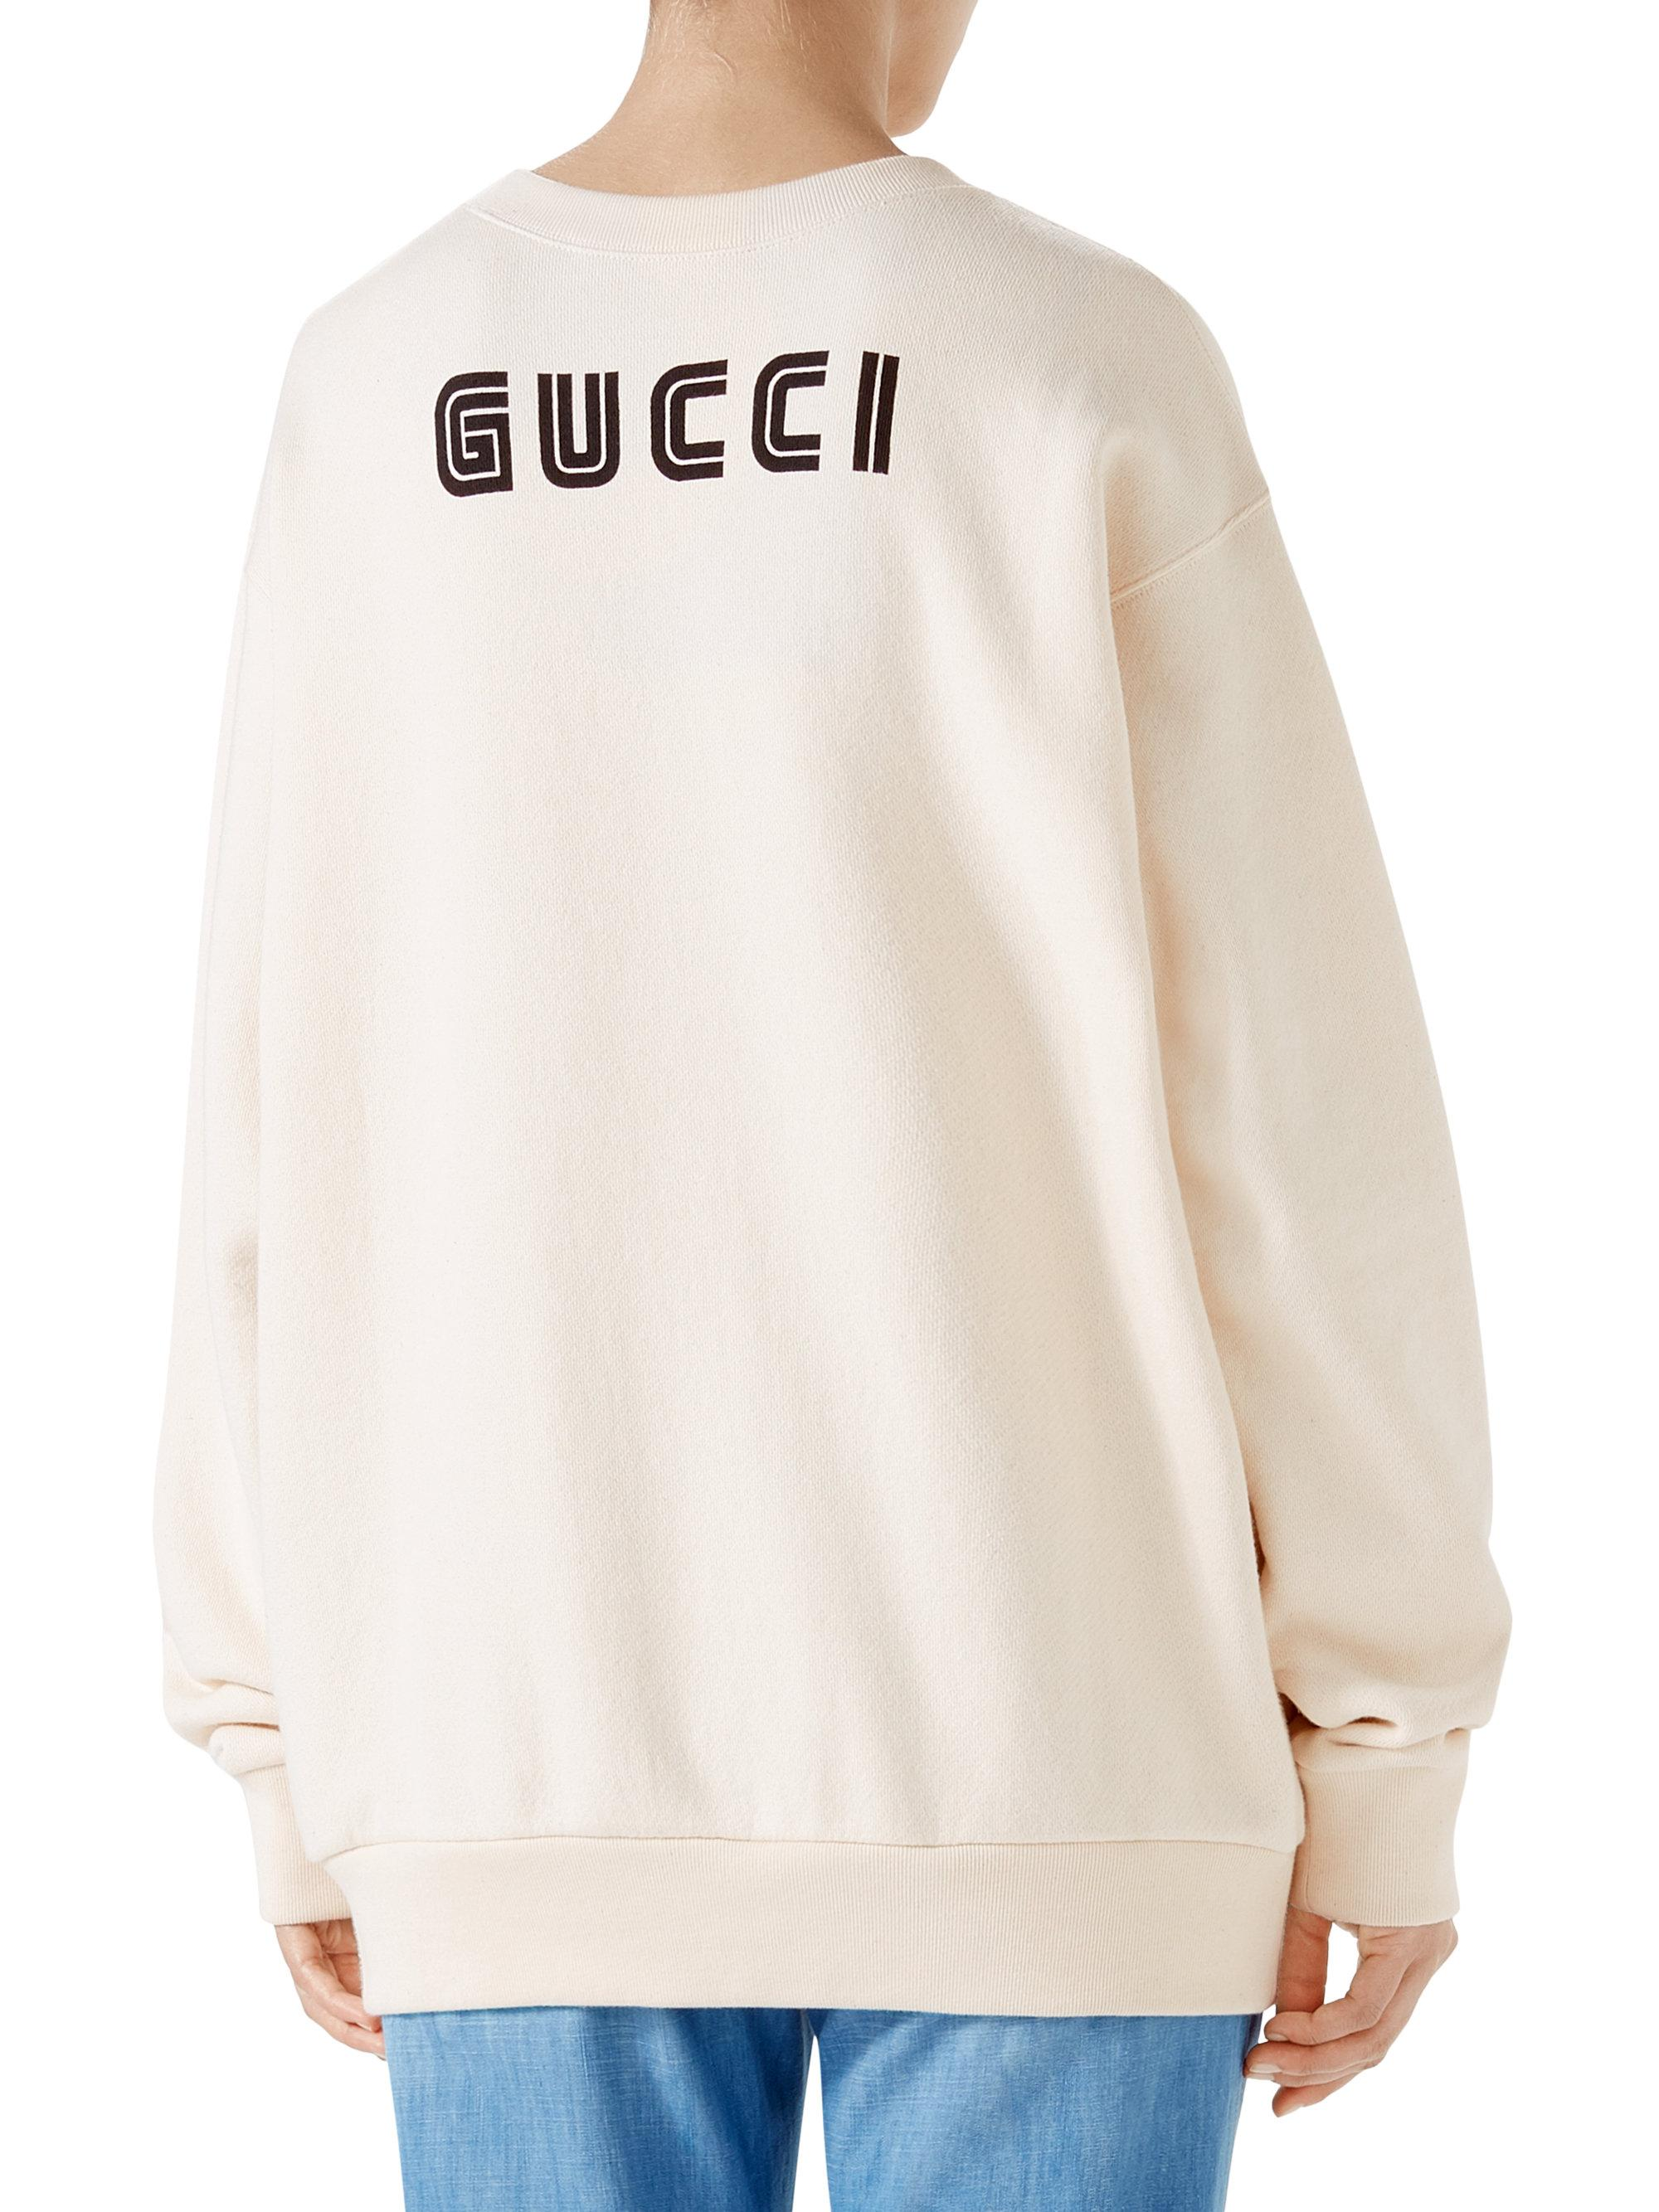 b8680f3d862 Lyst - Gucci Sequin Snow White Sweatshirt in White